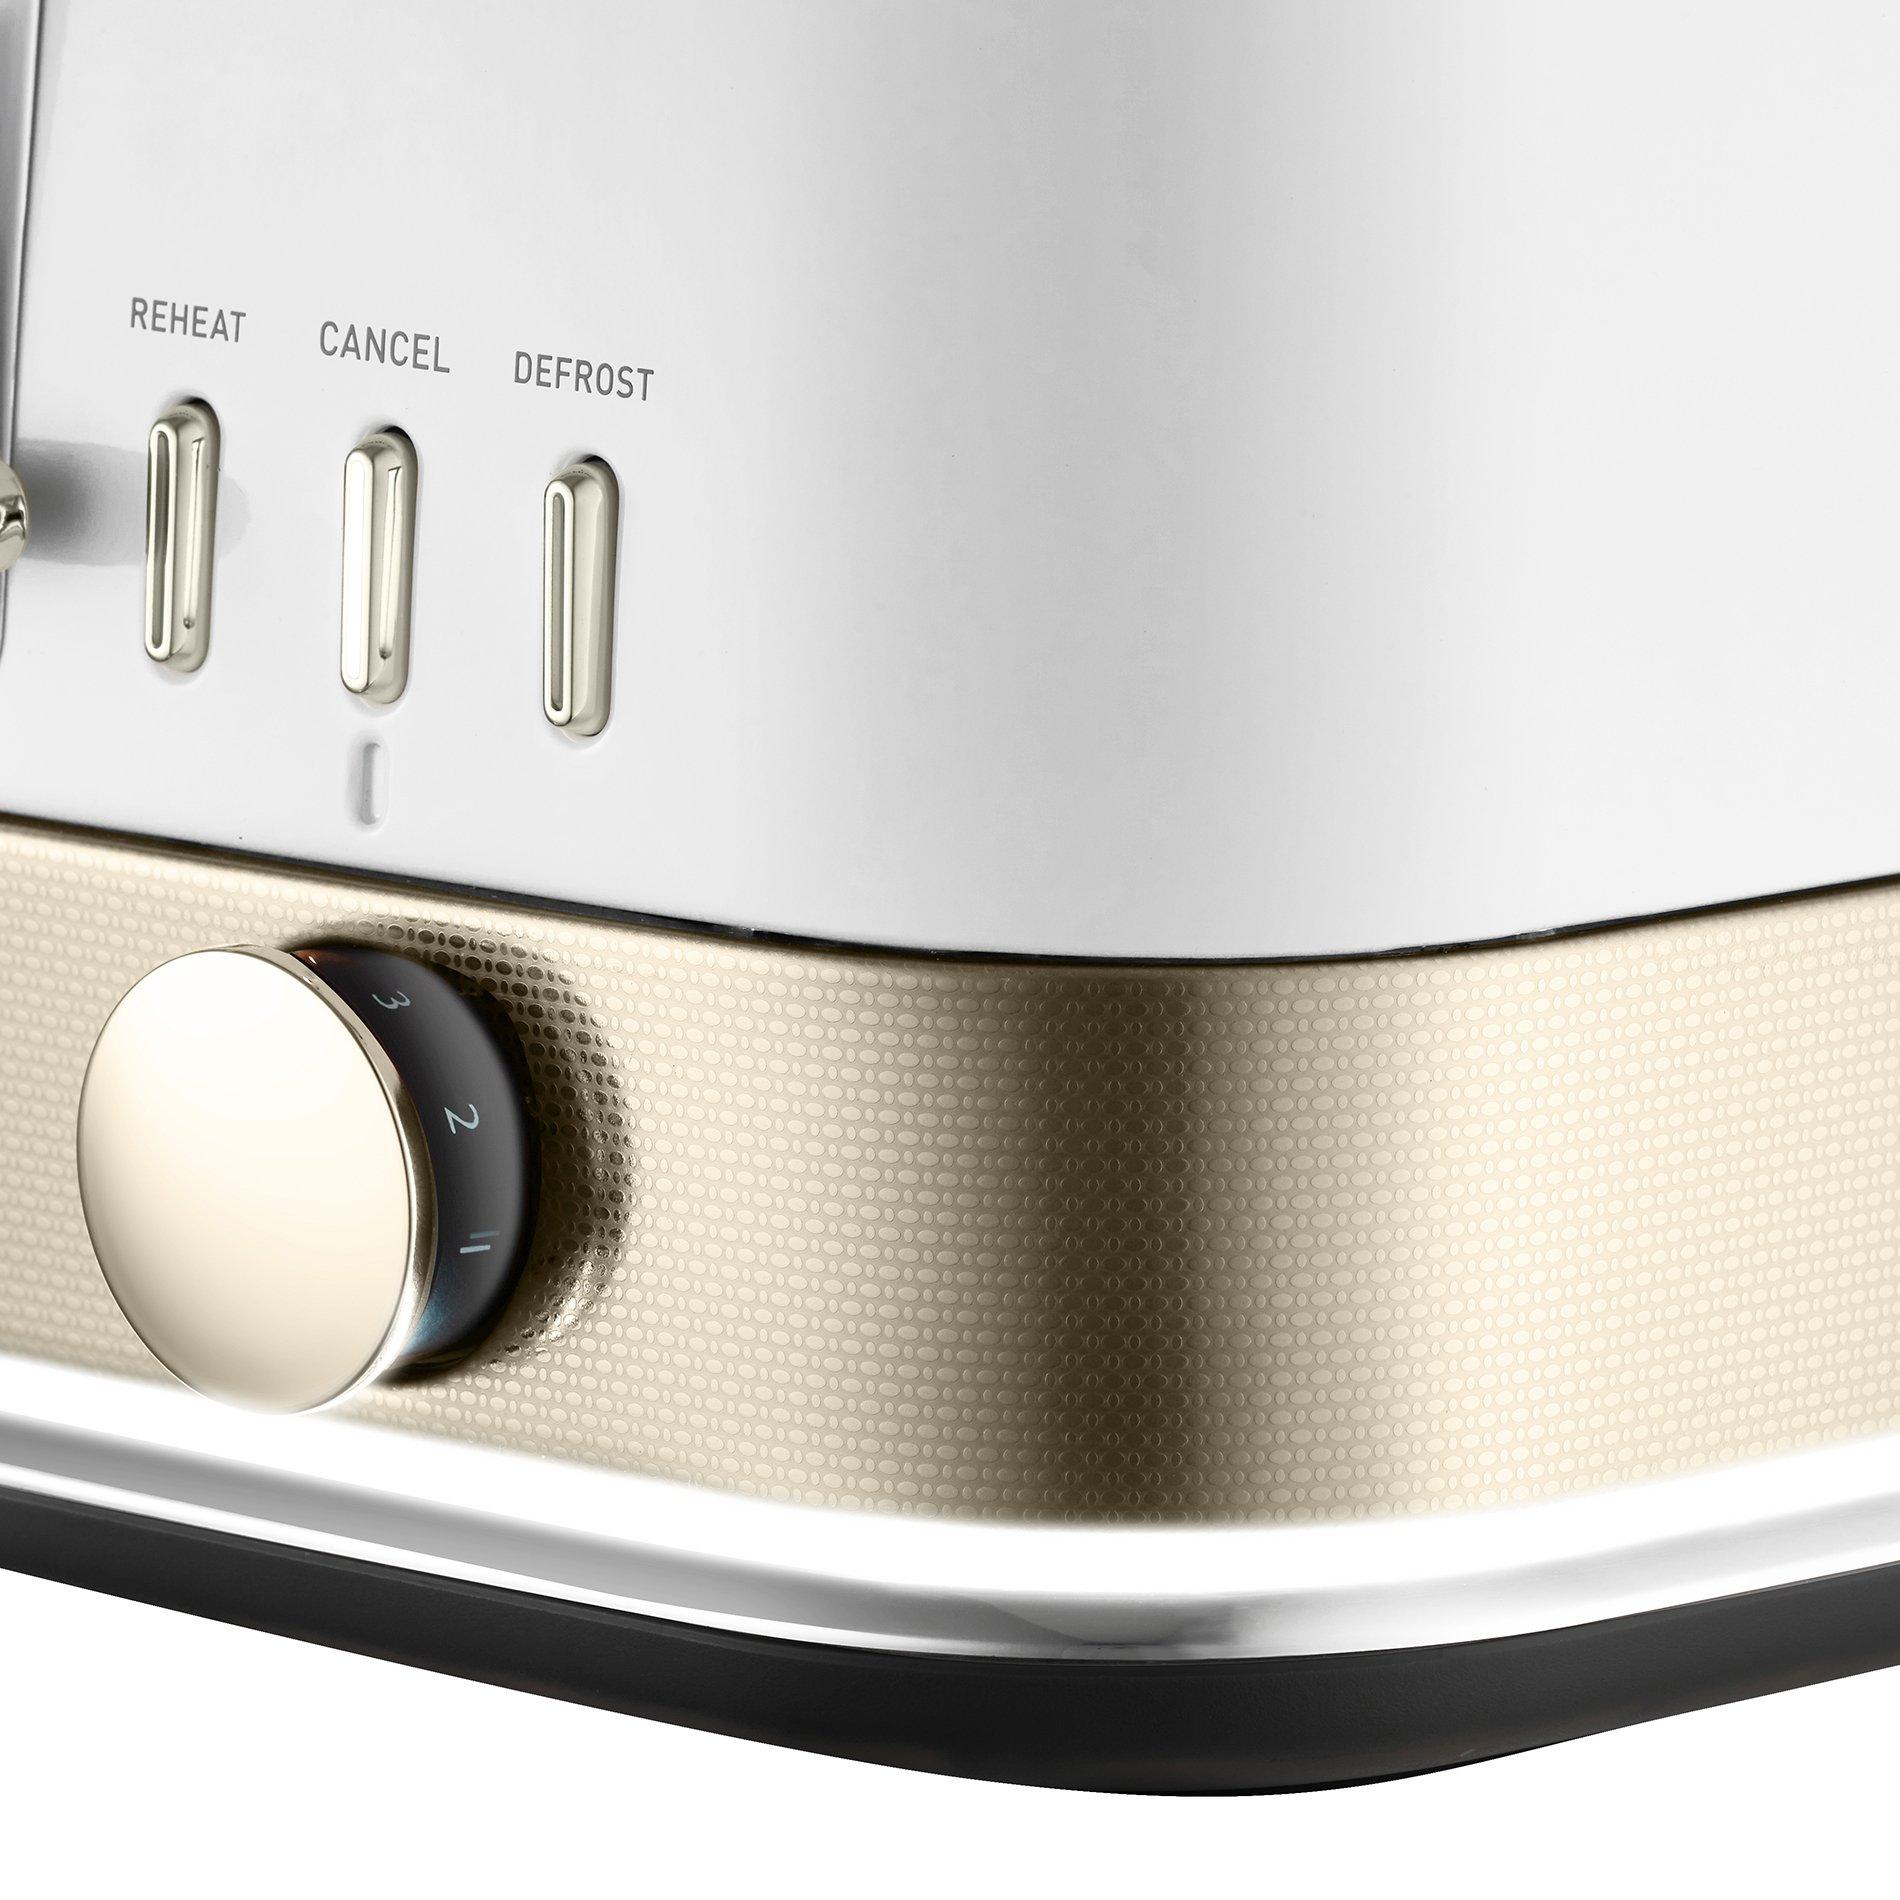 NEW Sunbeam New York Col Four Slice Toaster TA4440 White//Gold